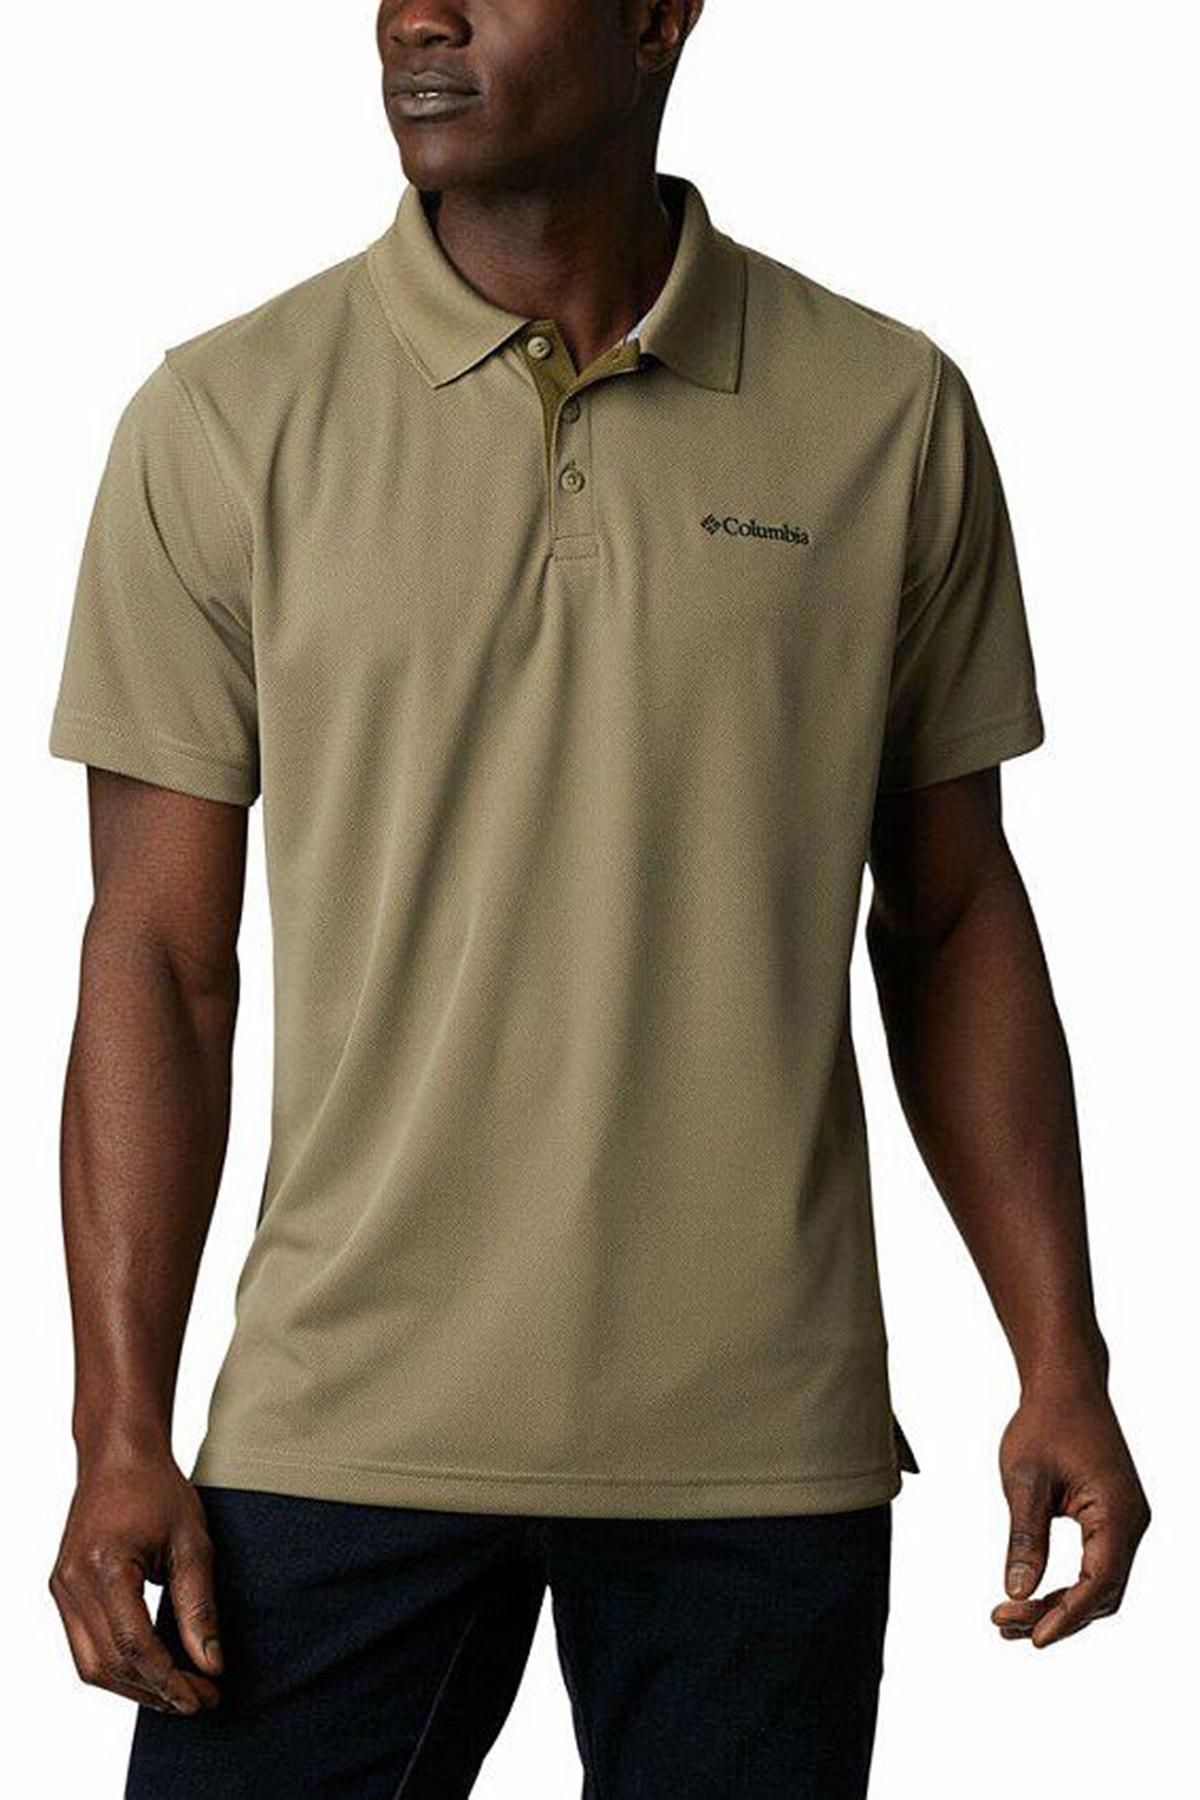 Columbia Ao0126 Utılızer Polo Yaka T-shirt 1772055365 1